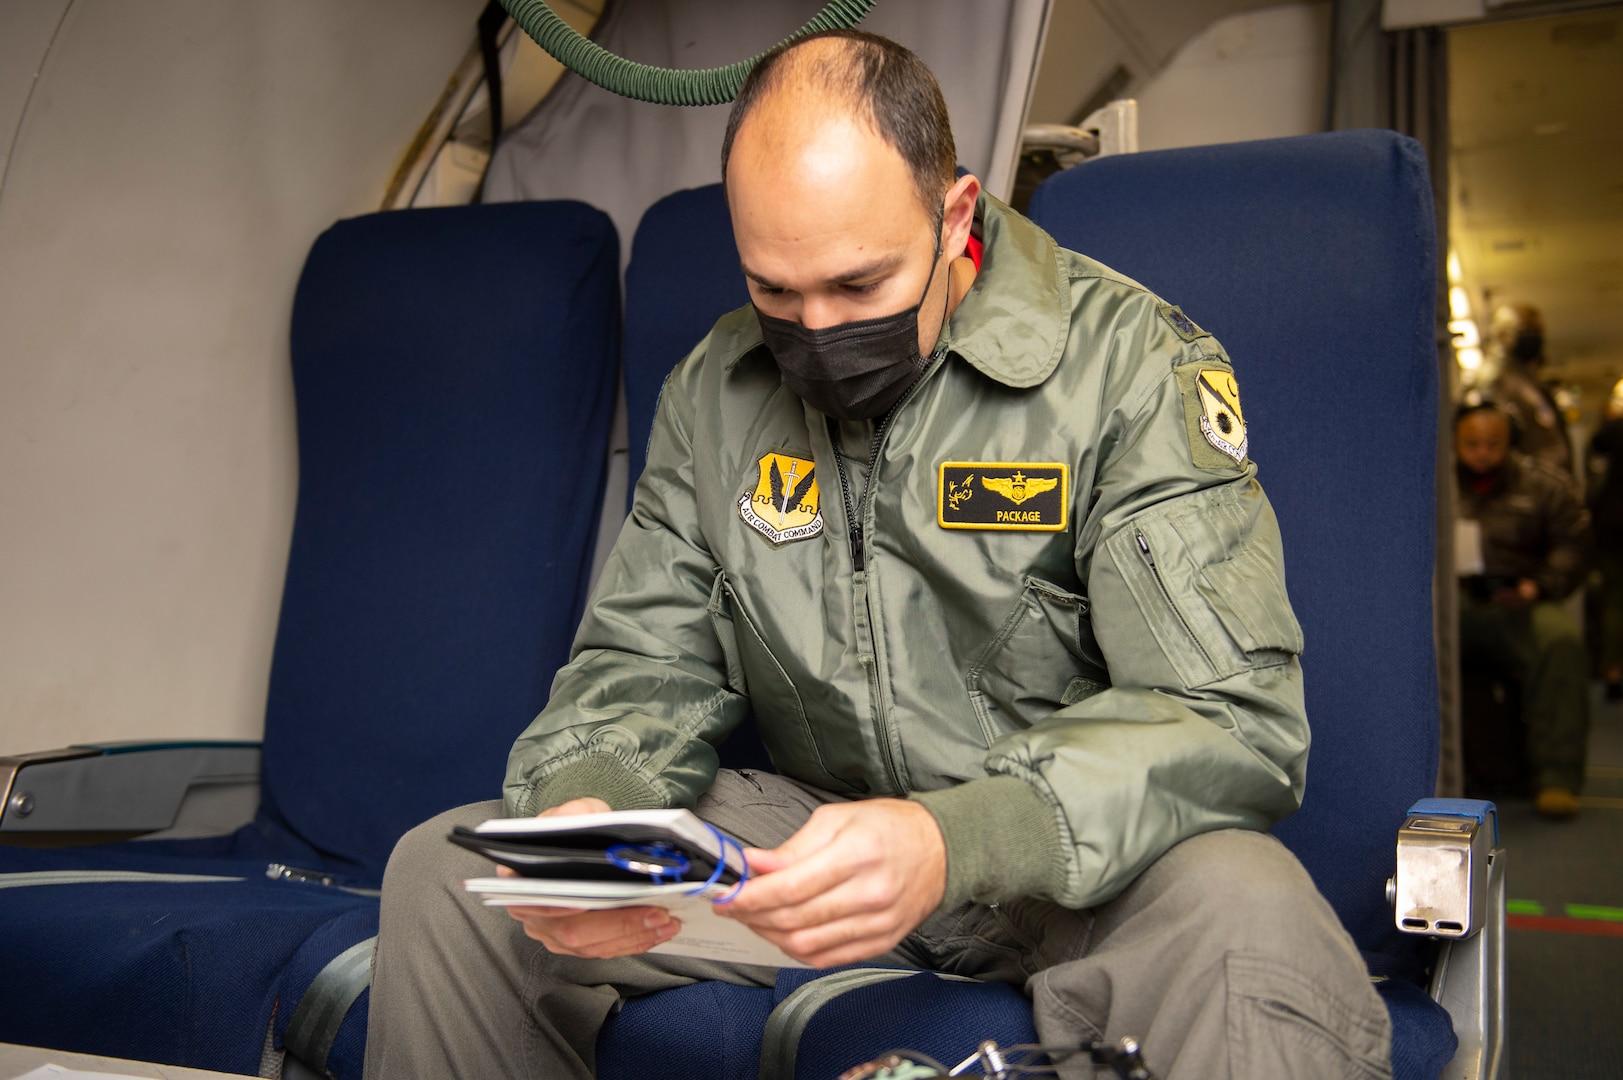 Photo shows man sitting in aircraft seat looking at manual.